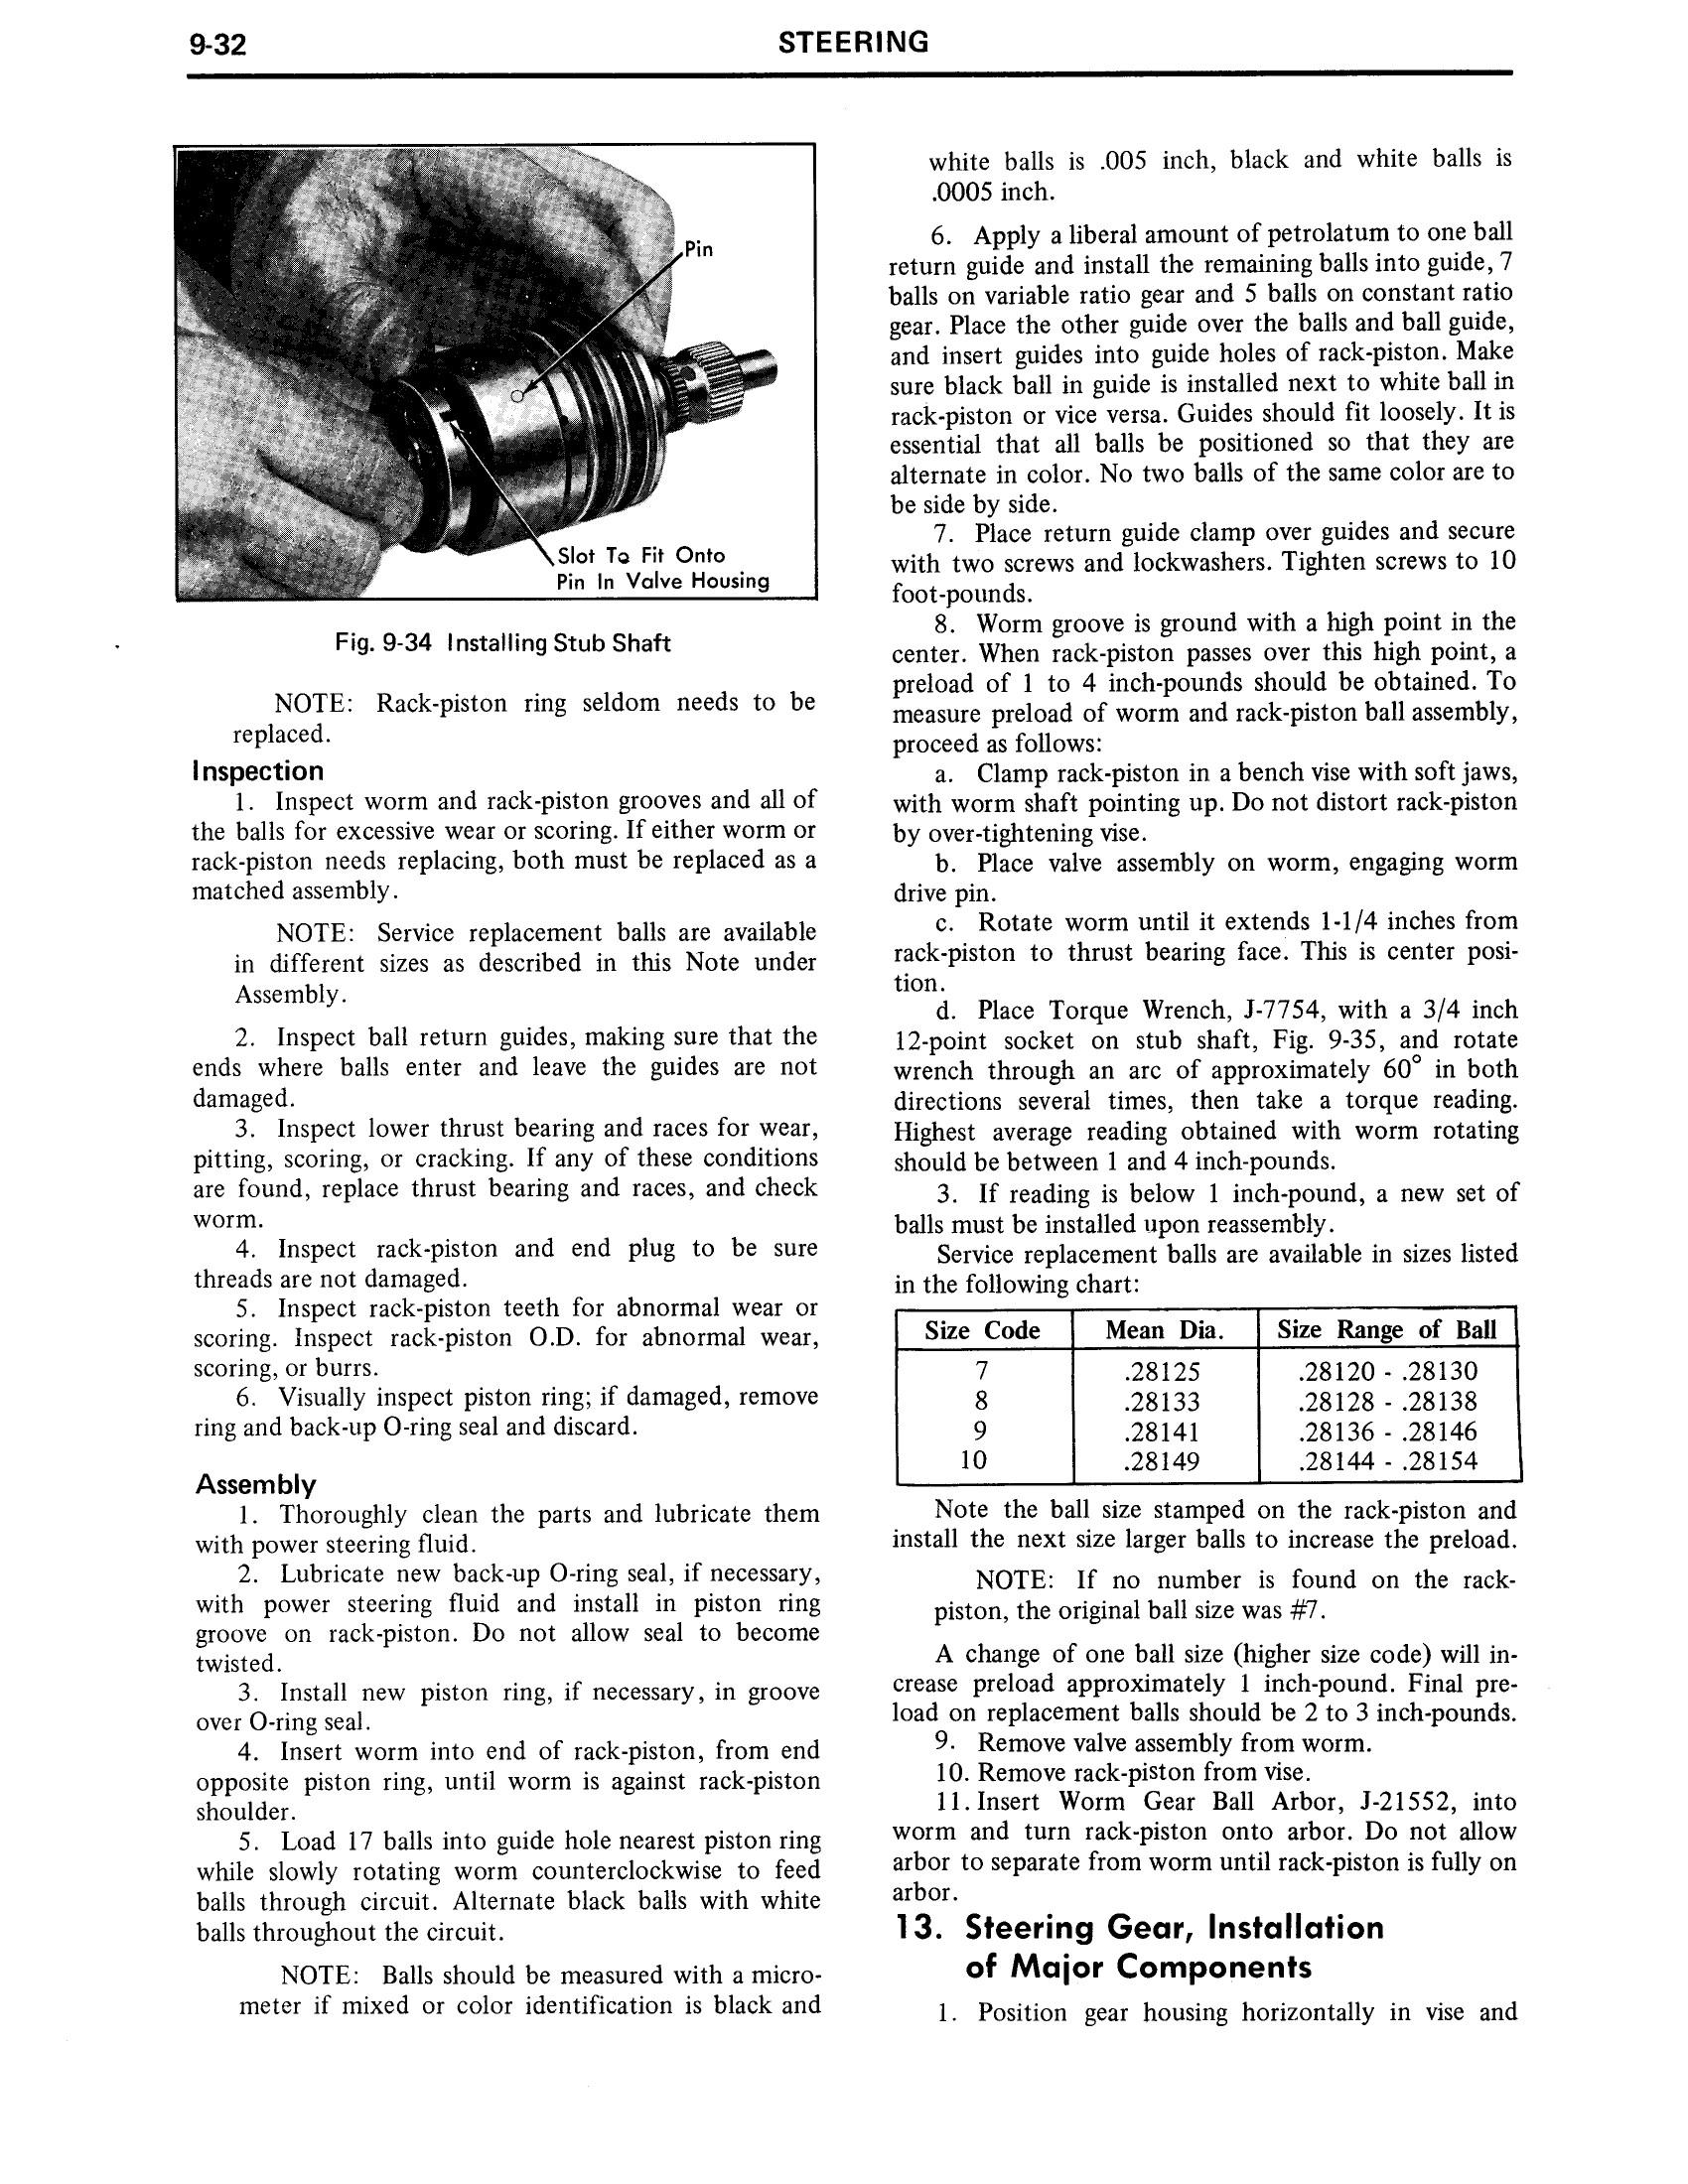 1971 Cadillac Shop Manual- Steering Page 32 of 58